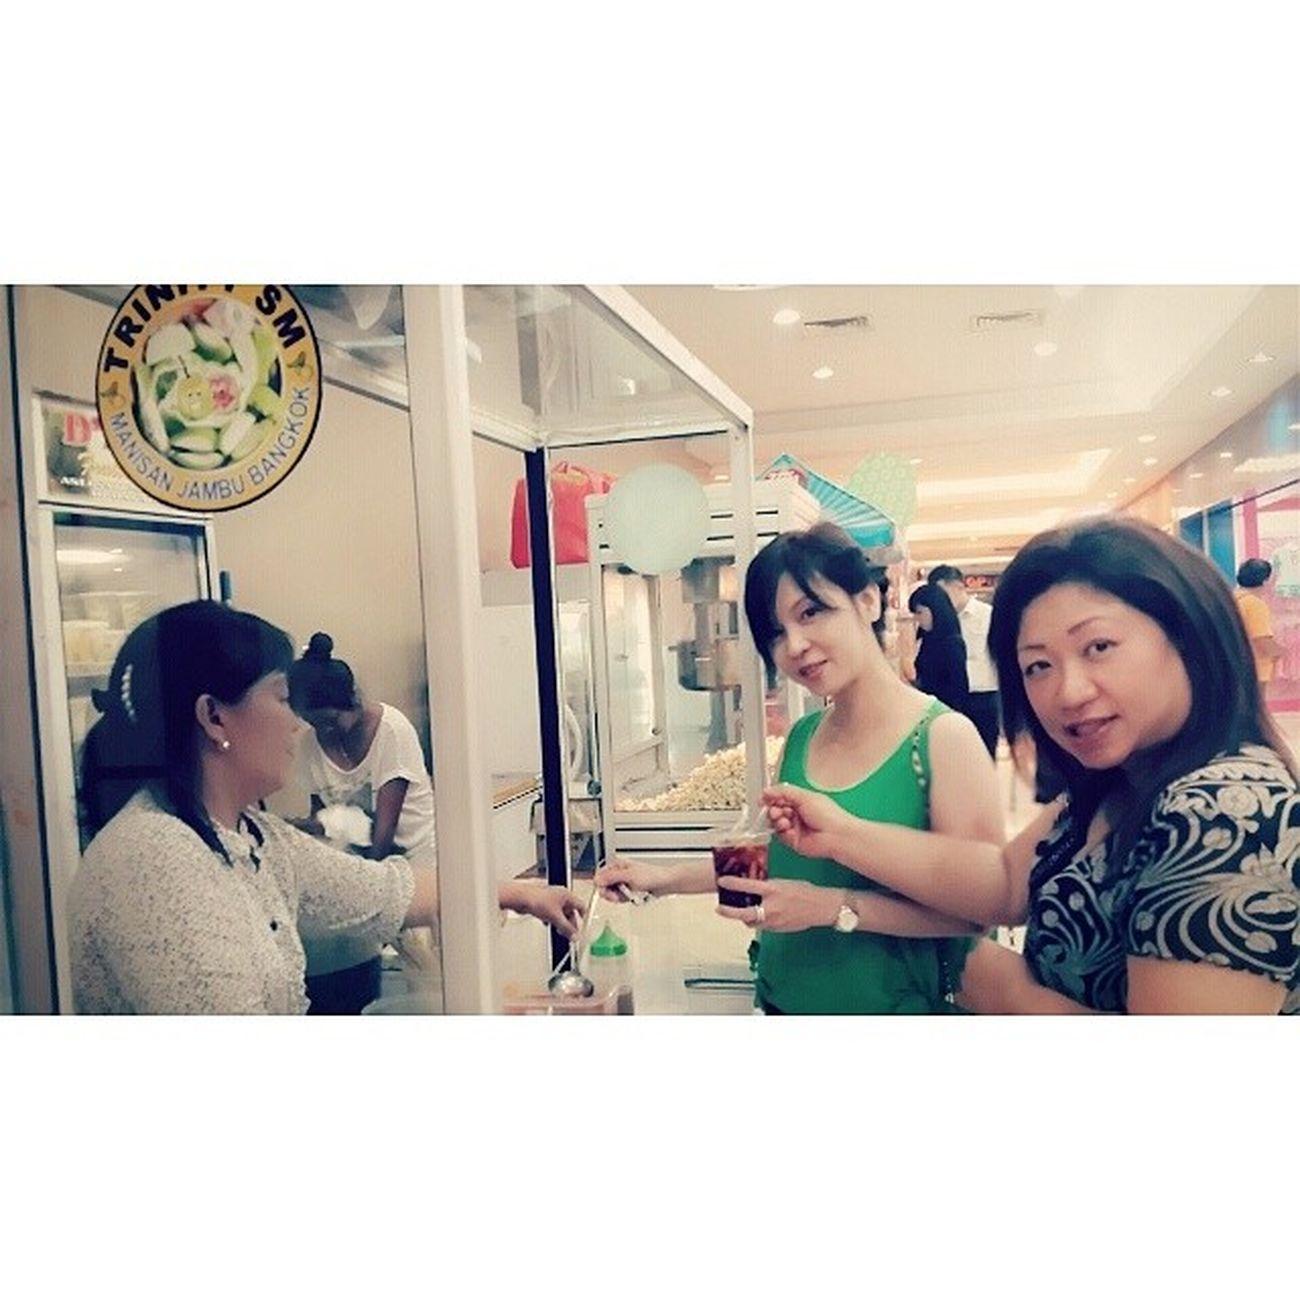 2014.05.12 Jajanan lokal Manado Manado MANTOS INDONESIA Snack Food